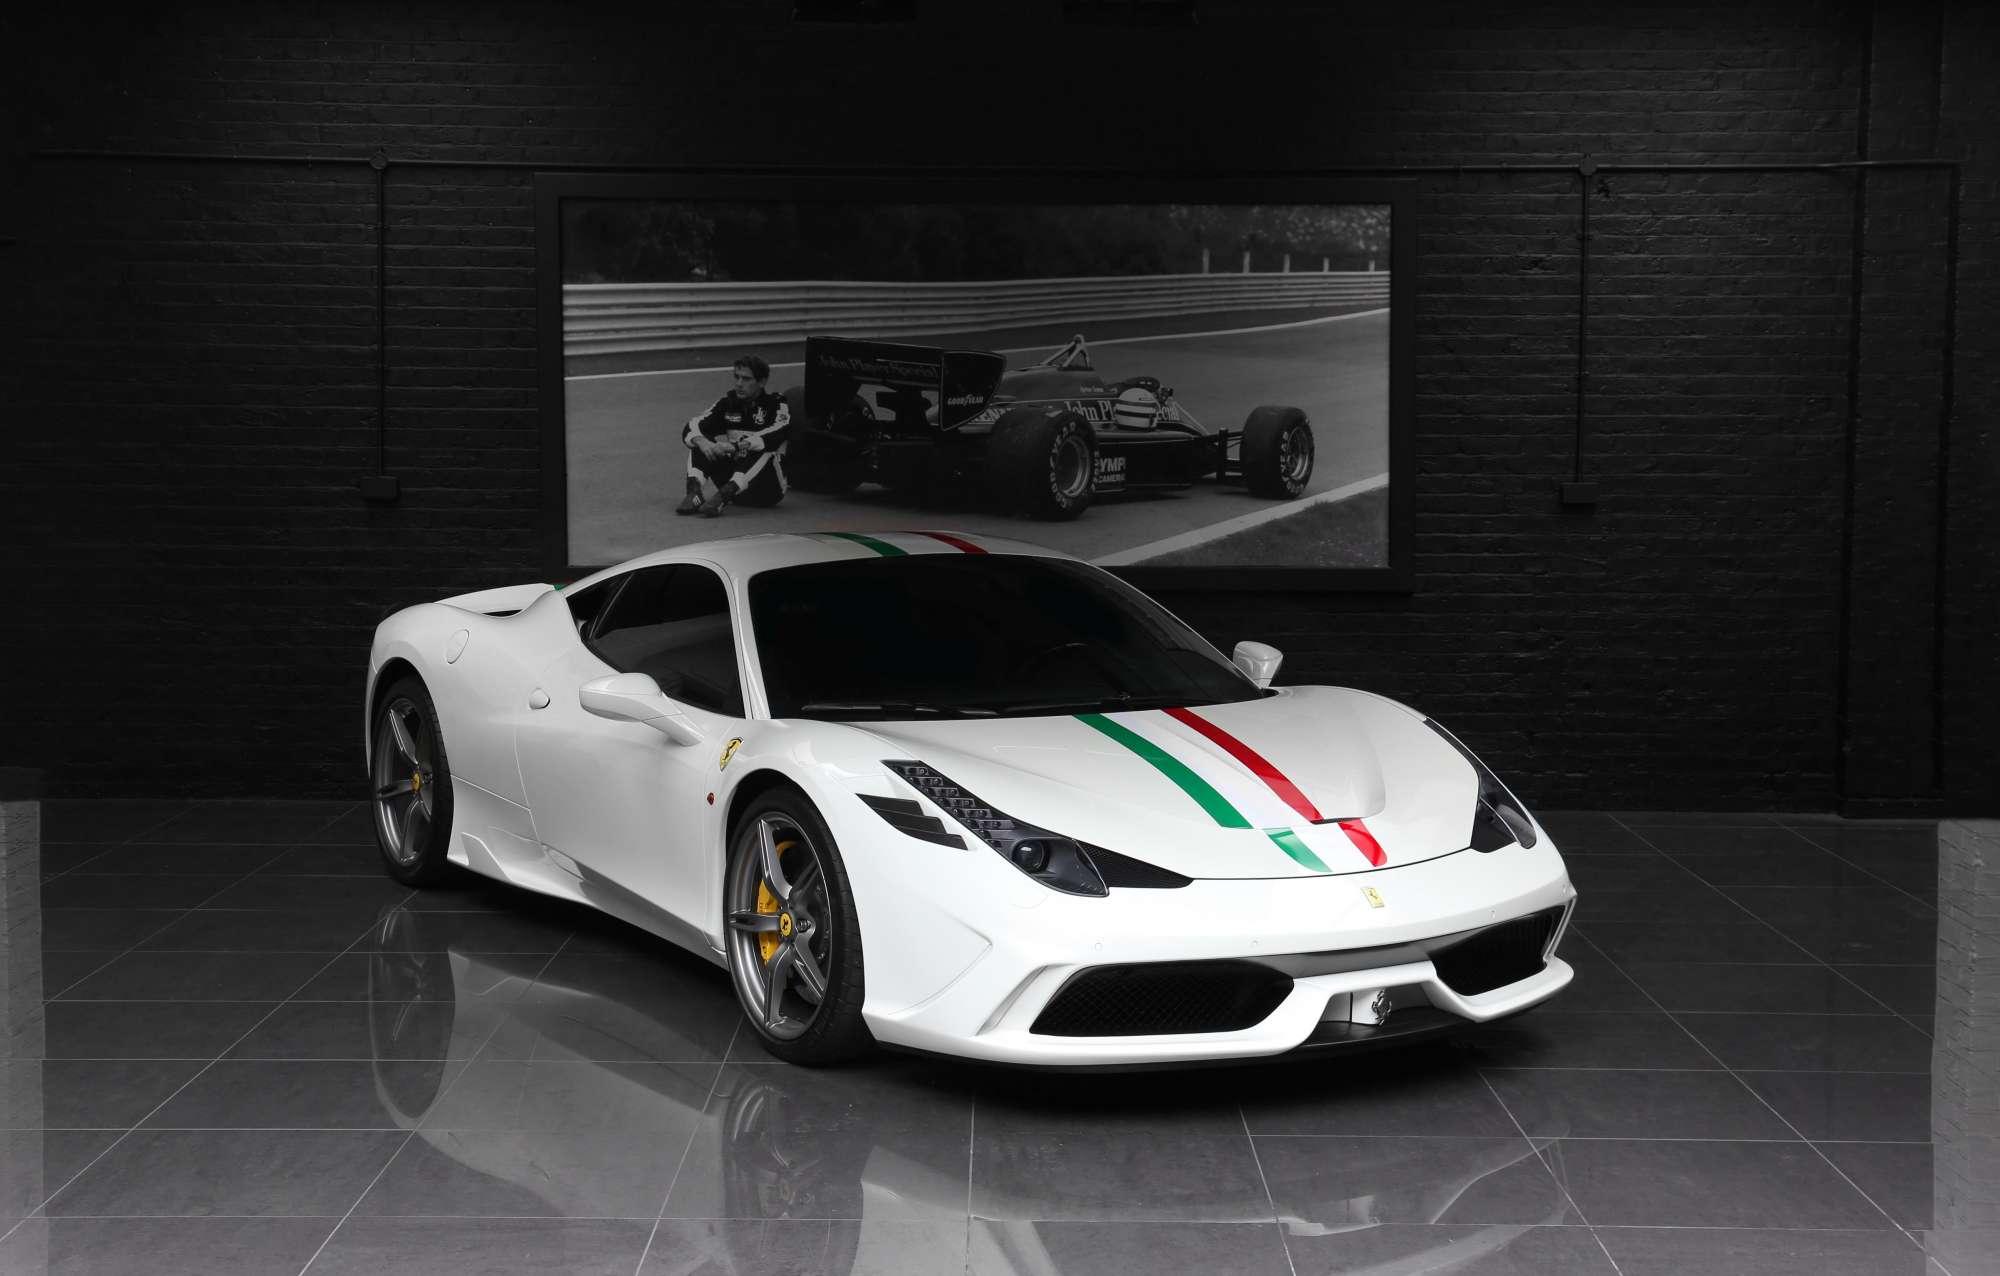 Lhd Ferrari 458 Speciale Pegasus Auto House